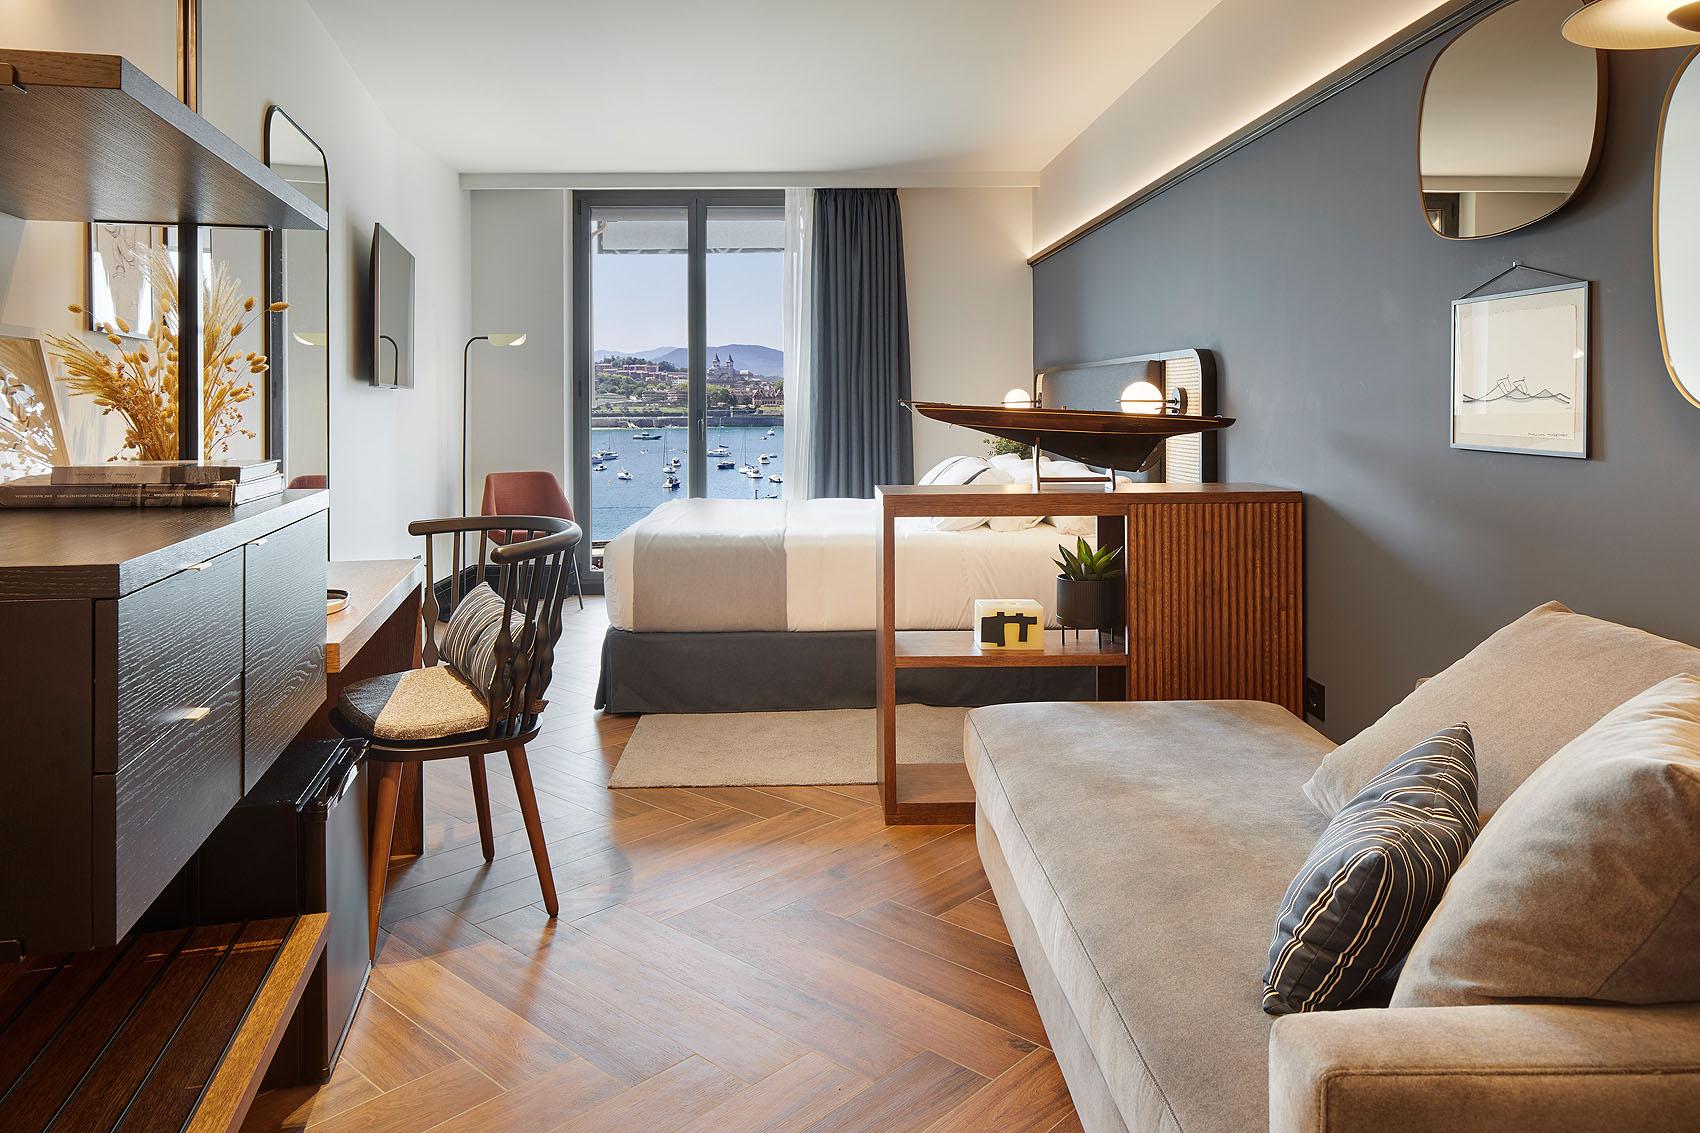 SANSEbay Hotel - Iñaki Caperochipi - Fotografía